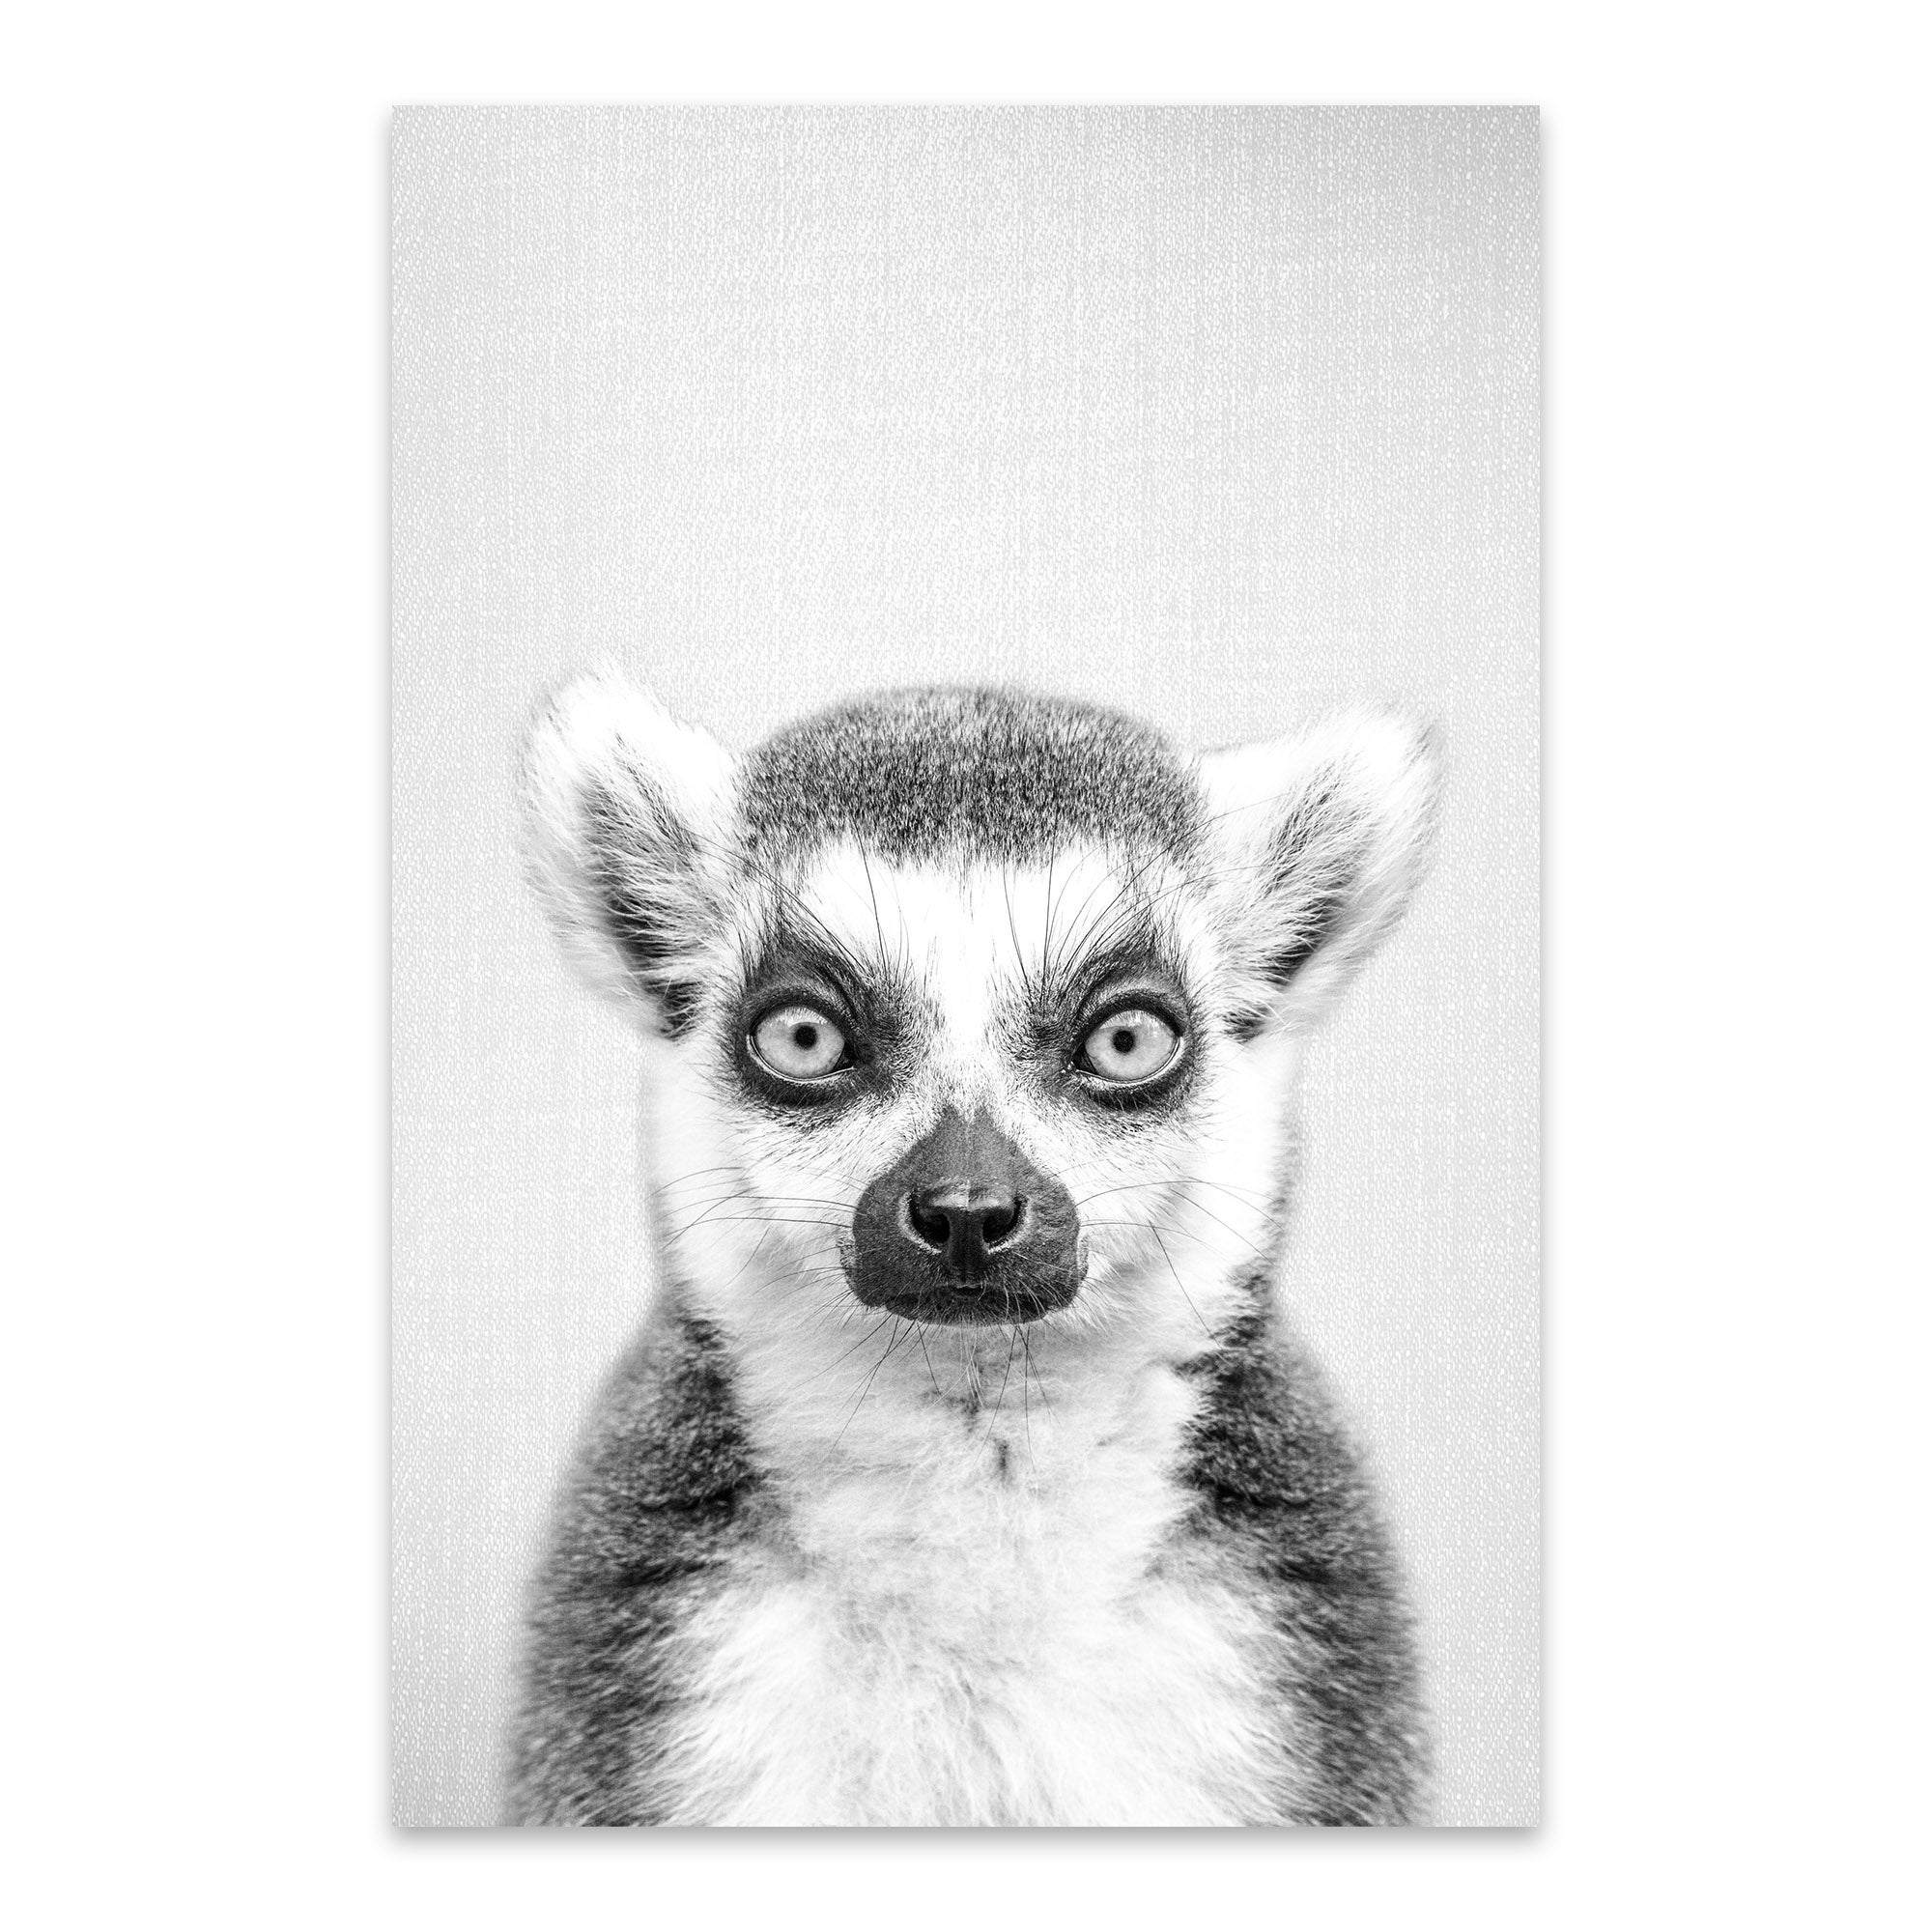 Noir Gallery Lemur Black And White Nursery Animal Metal Wall Art Print